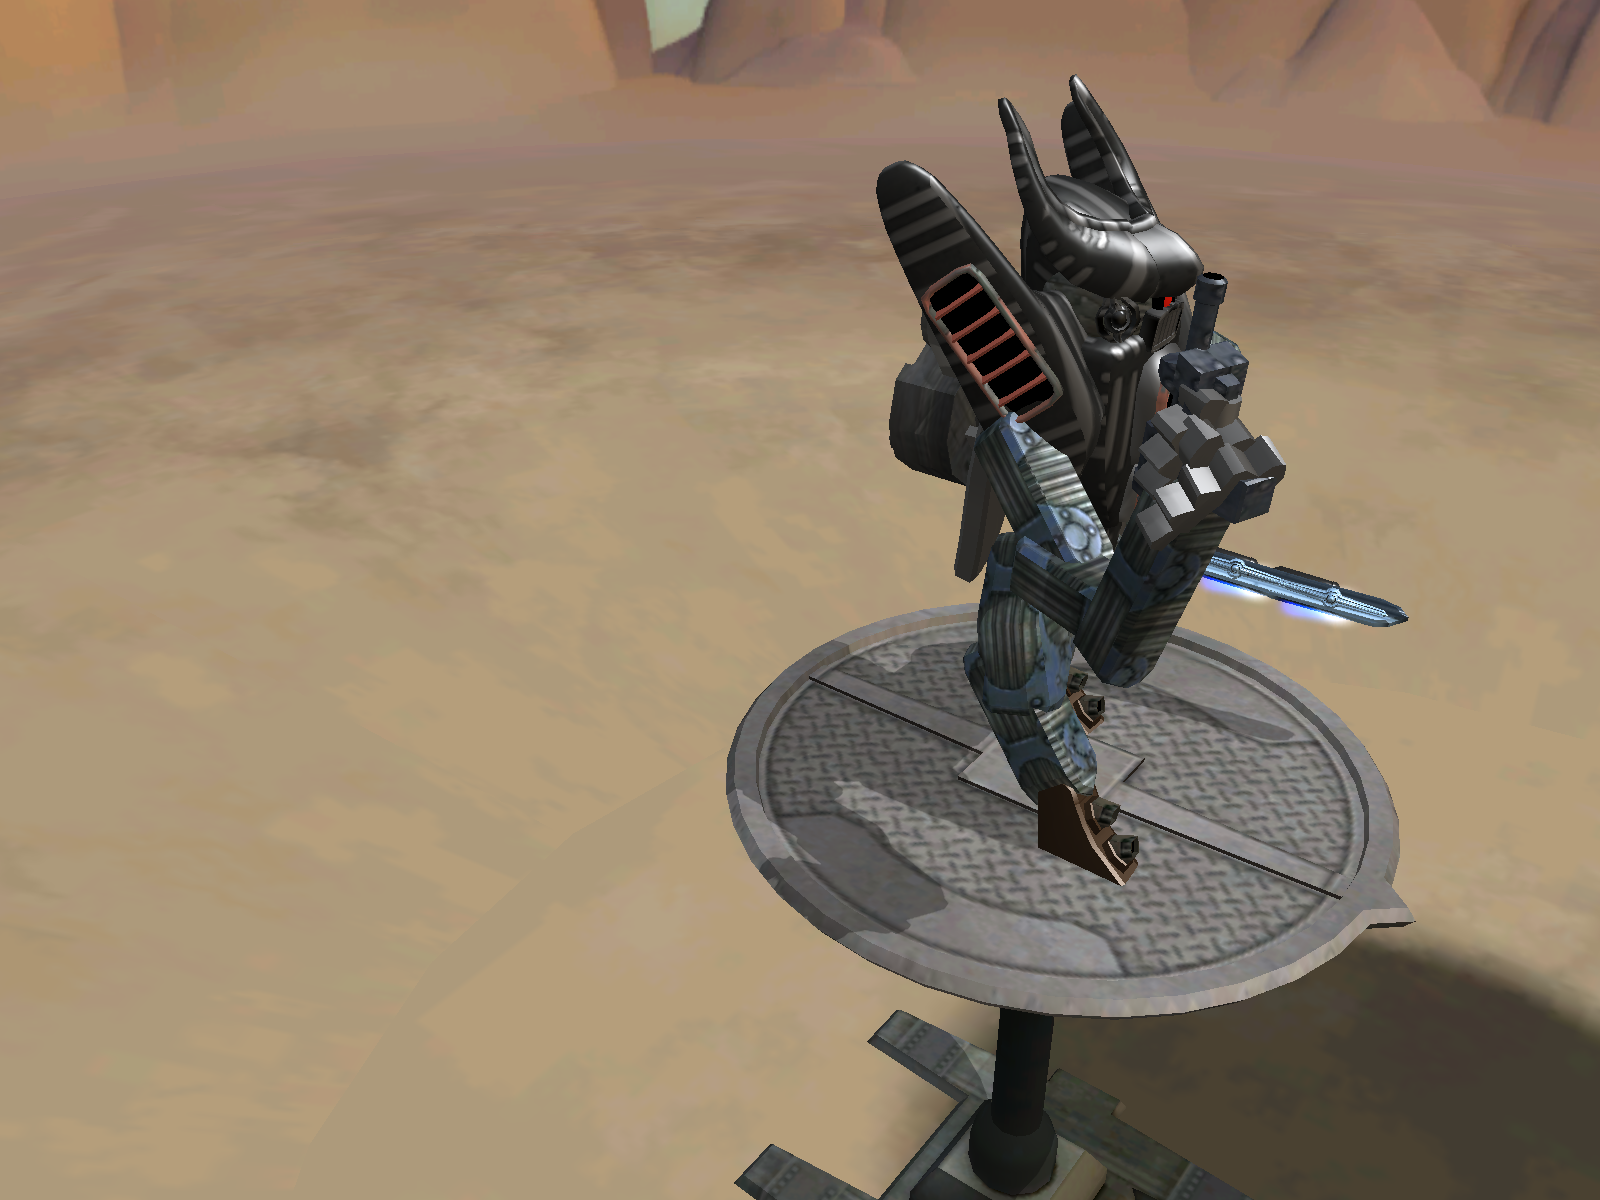 Juguete Navideño: Robot Ekonotria[SN][E] Spore-09-01-2020-01-51-04